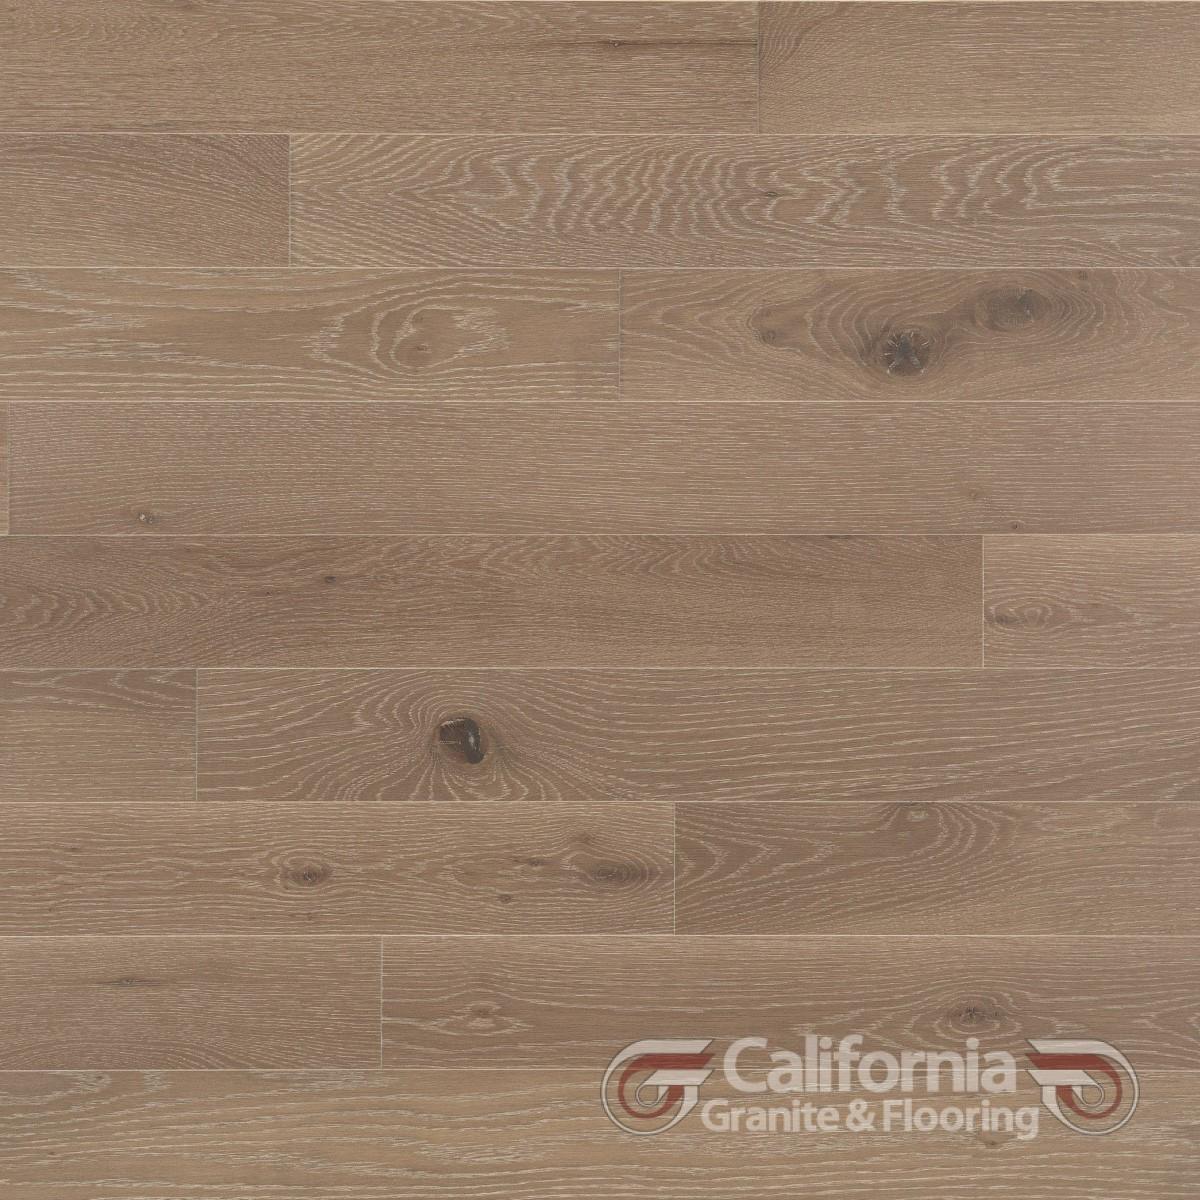 hardwood-flooring-white-oak-sand-castle-character-brushed-herringbone-2